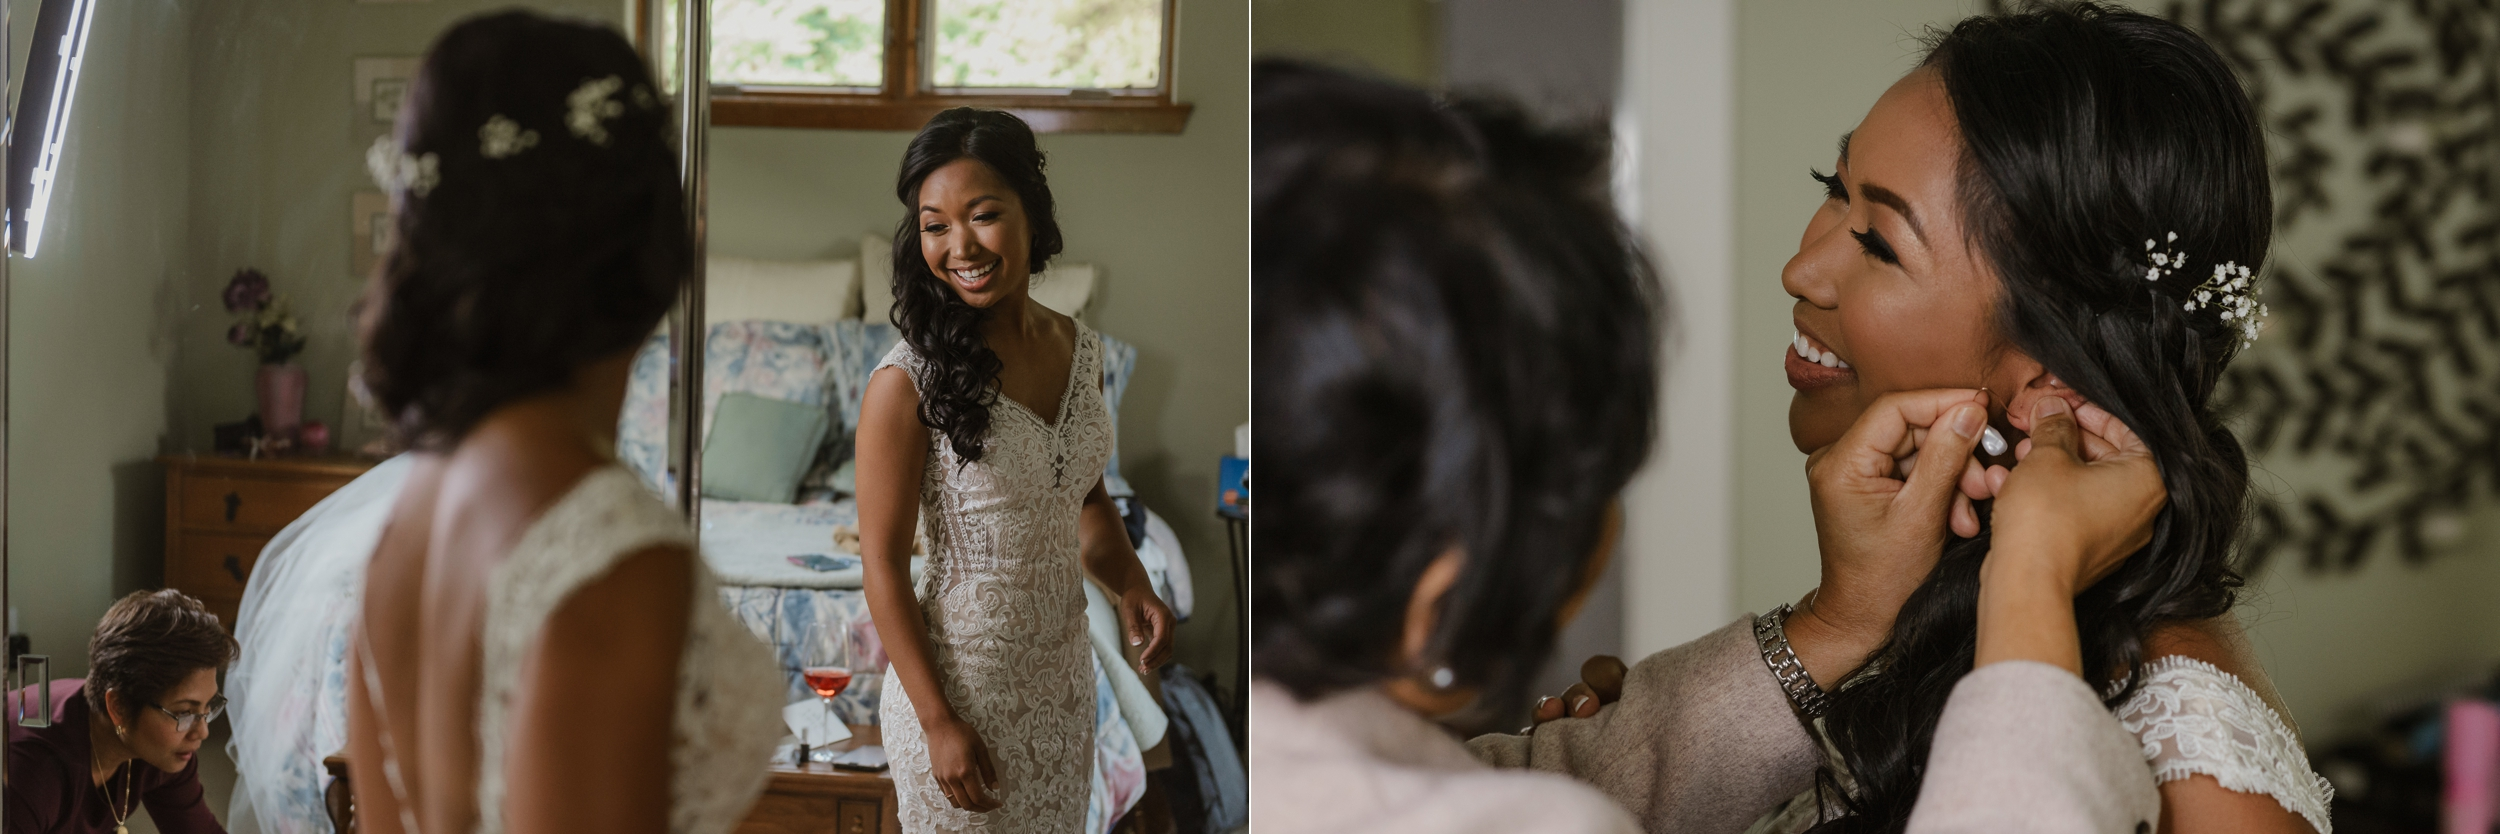 011marin-petaluma-backyard-wedding-vivianchen-096_WEB.jpg